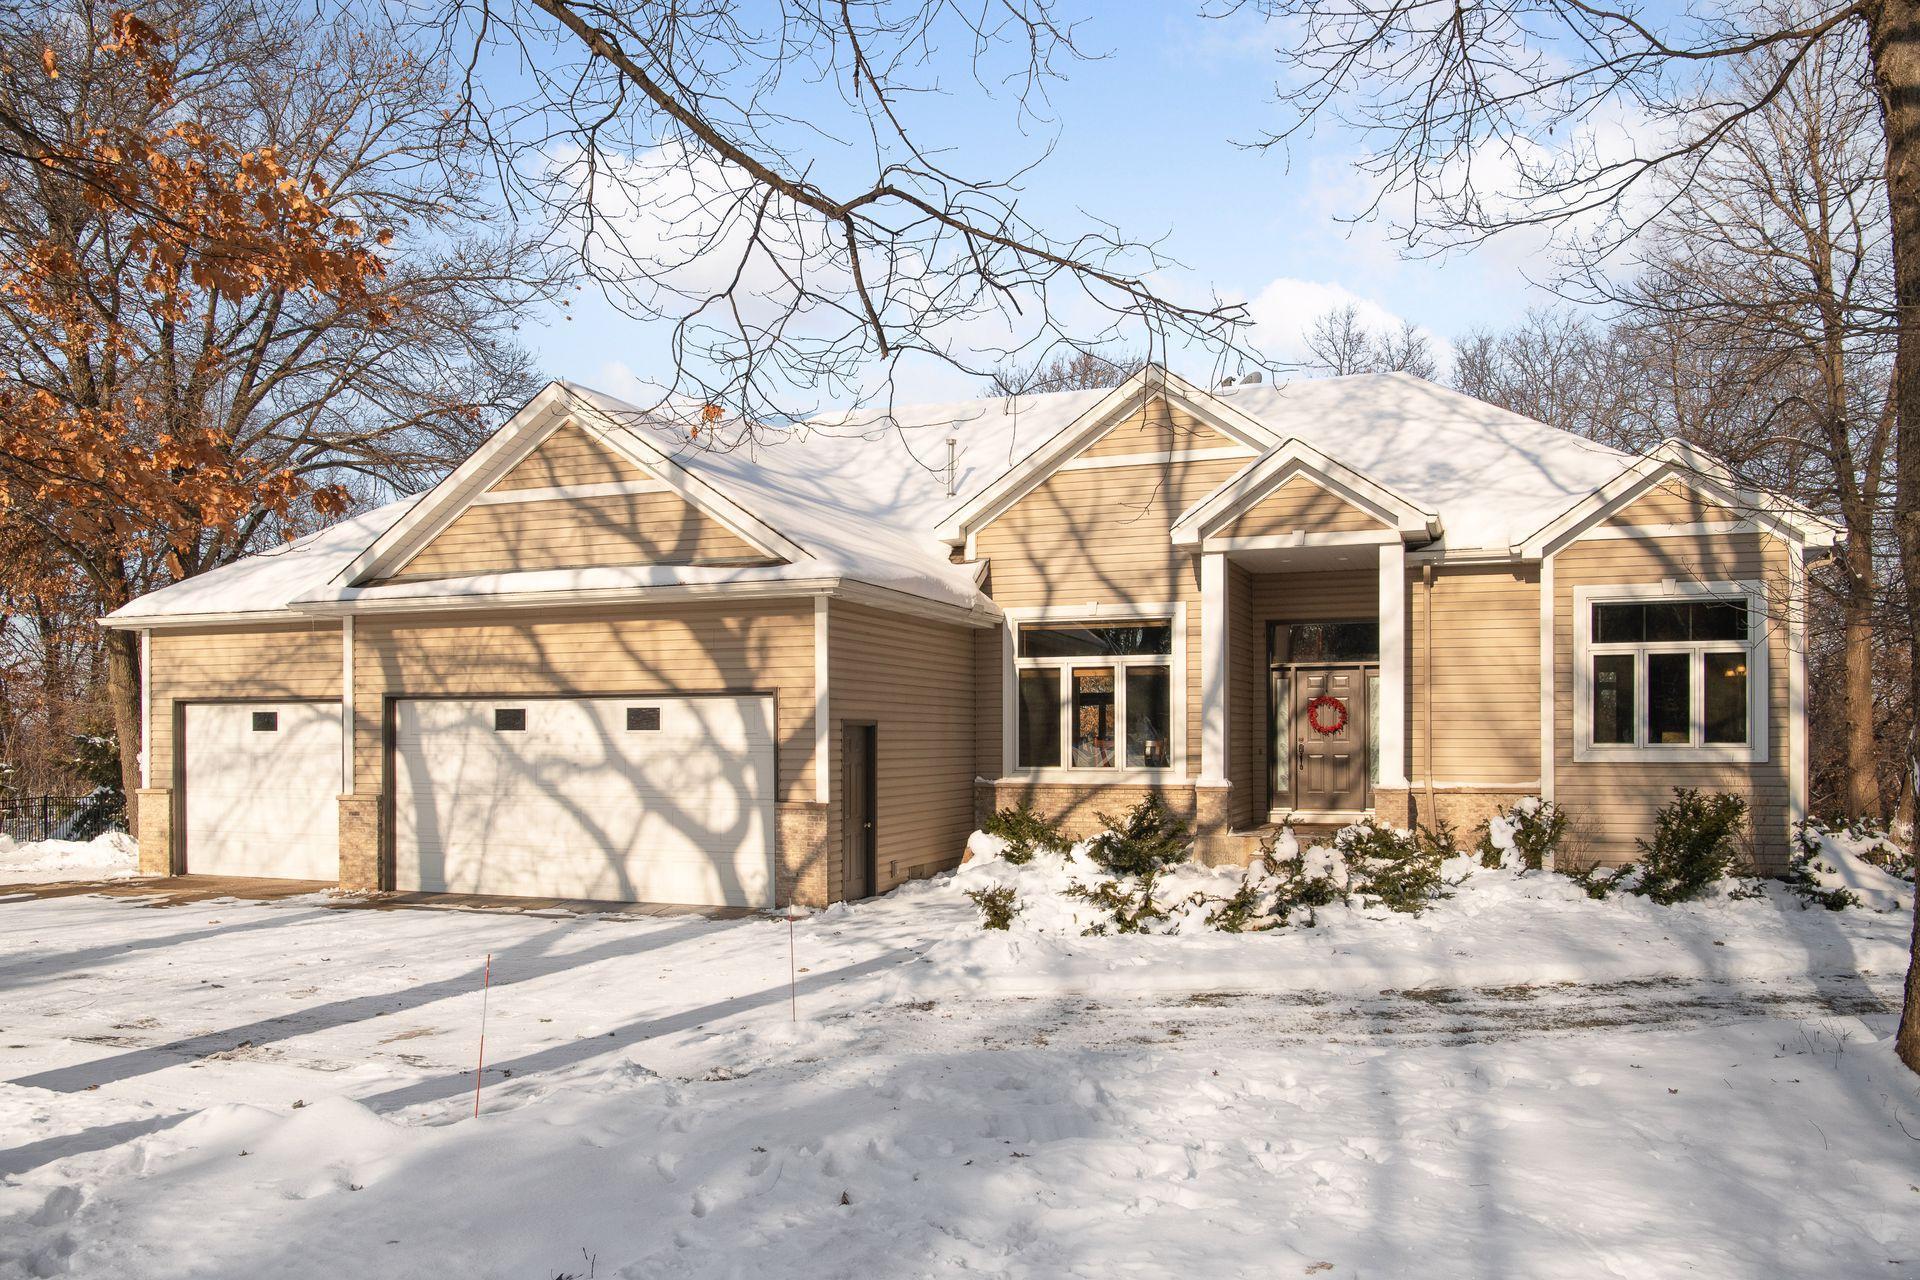 22620 Heather Ridge Property Photo - Rogers, MN real estate listing